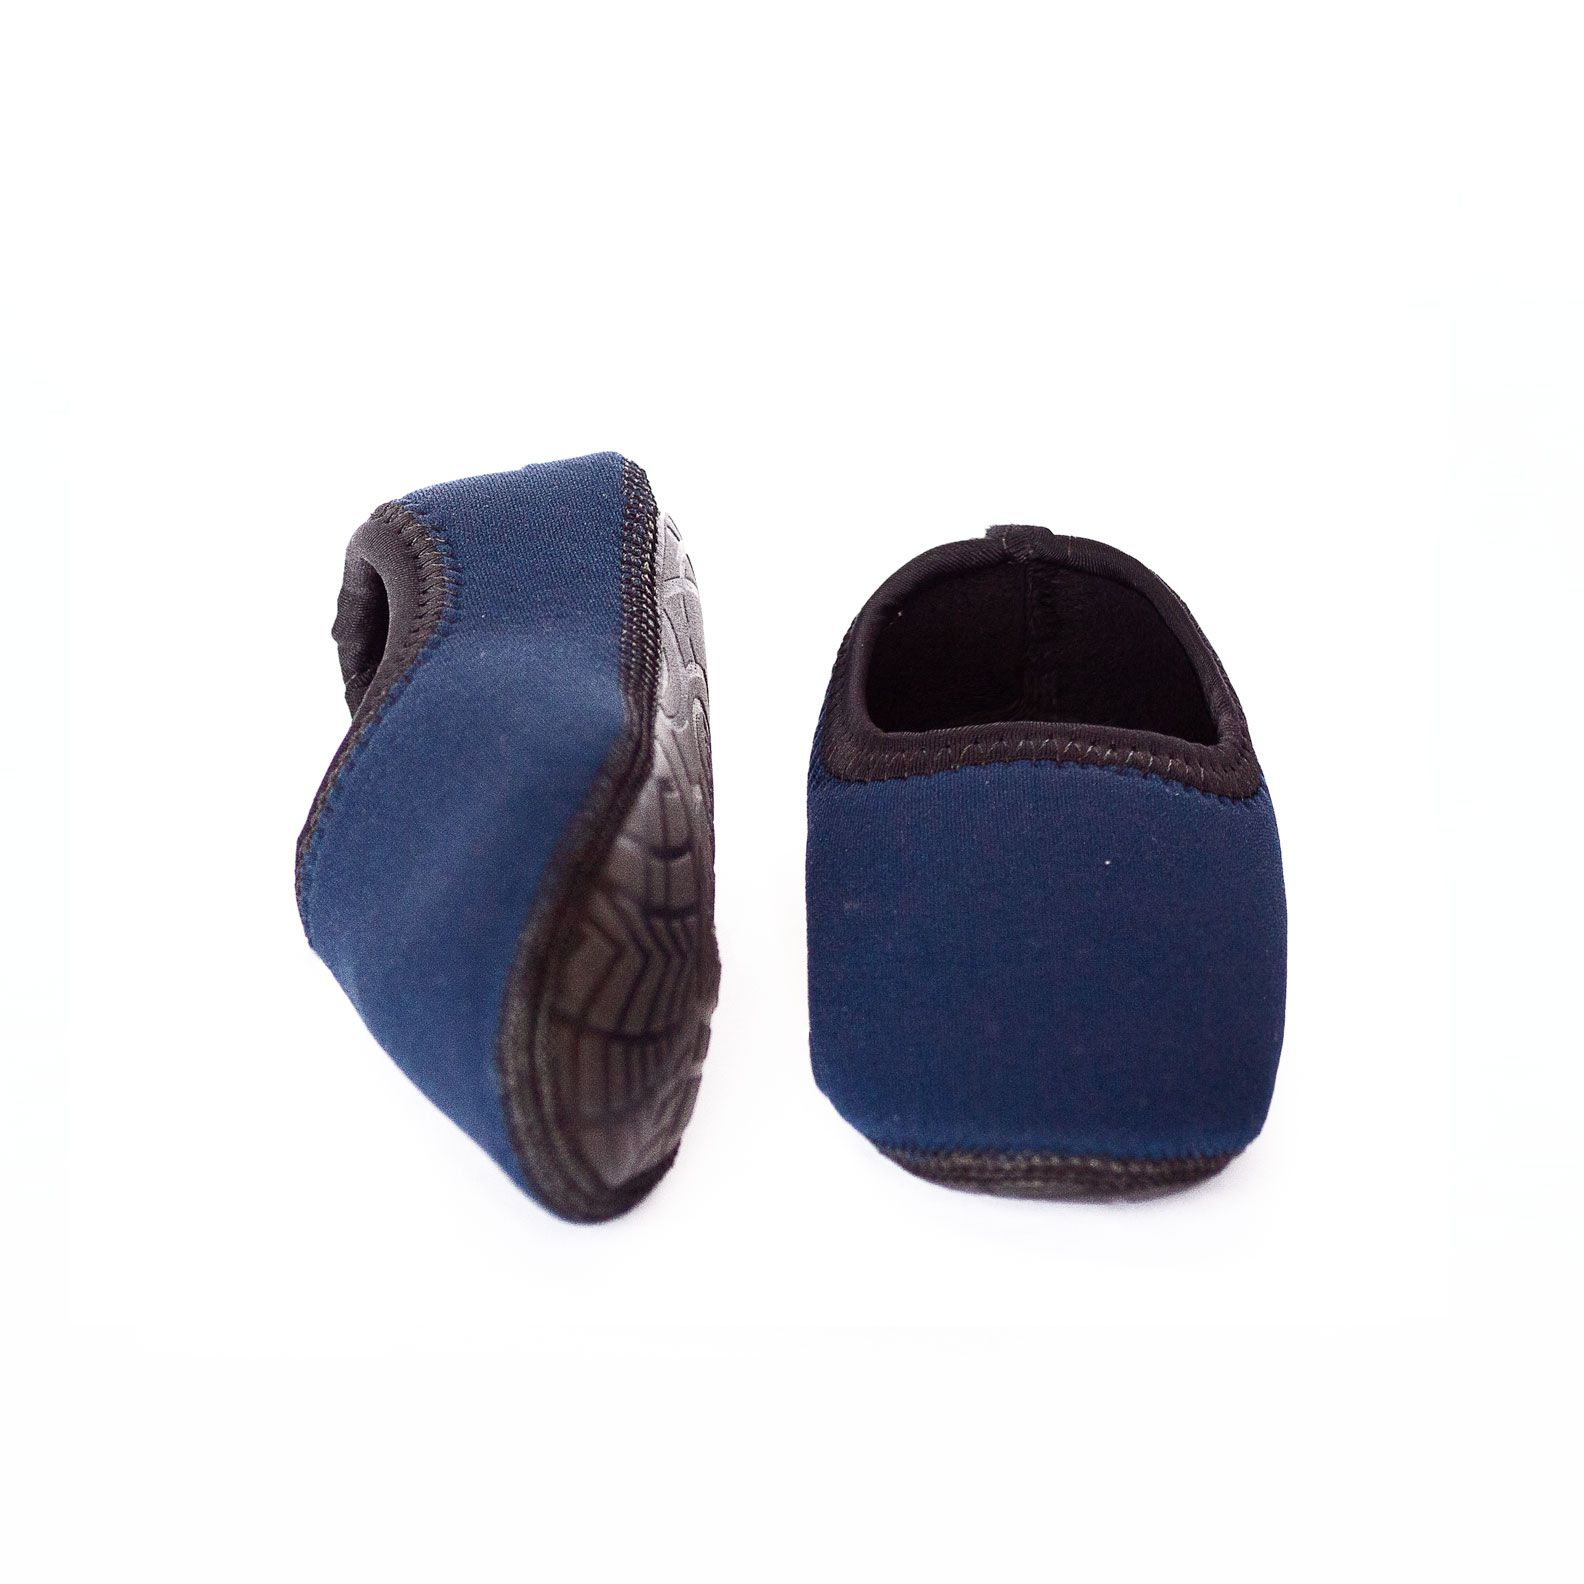 Sapato de Neoprene Infantil Fit Azul Marinho Ufrog